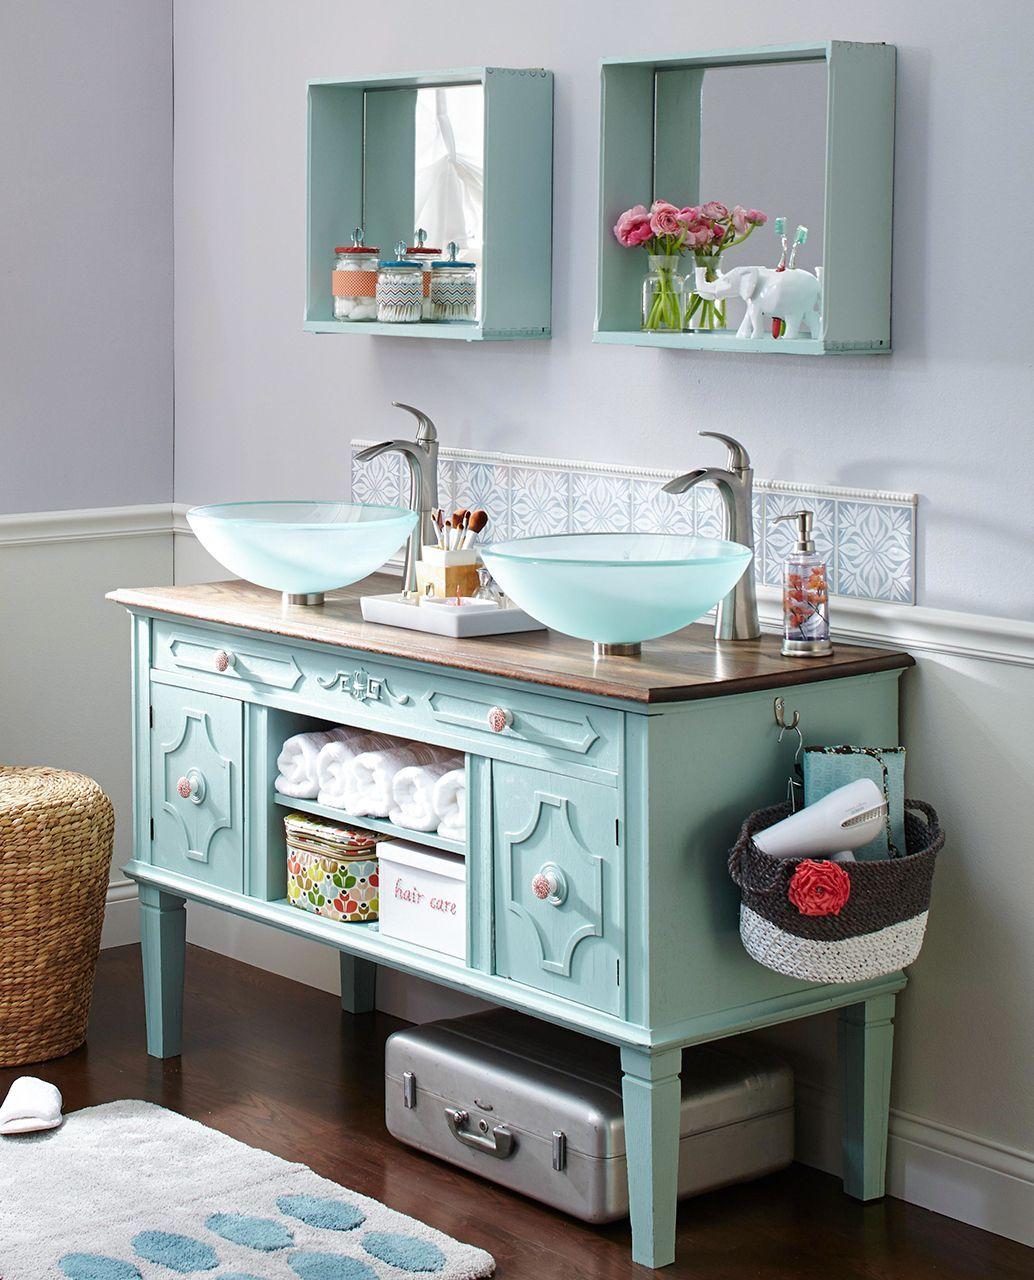 18 Diy Bathroom Vanity Ideas For Custom Storage And Style Unique Bathroom Vanity Diy Bathroom Vanity Diy Bathroom Makeover